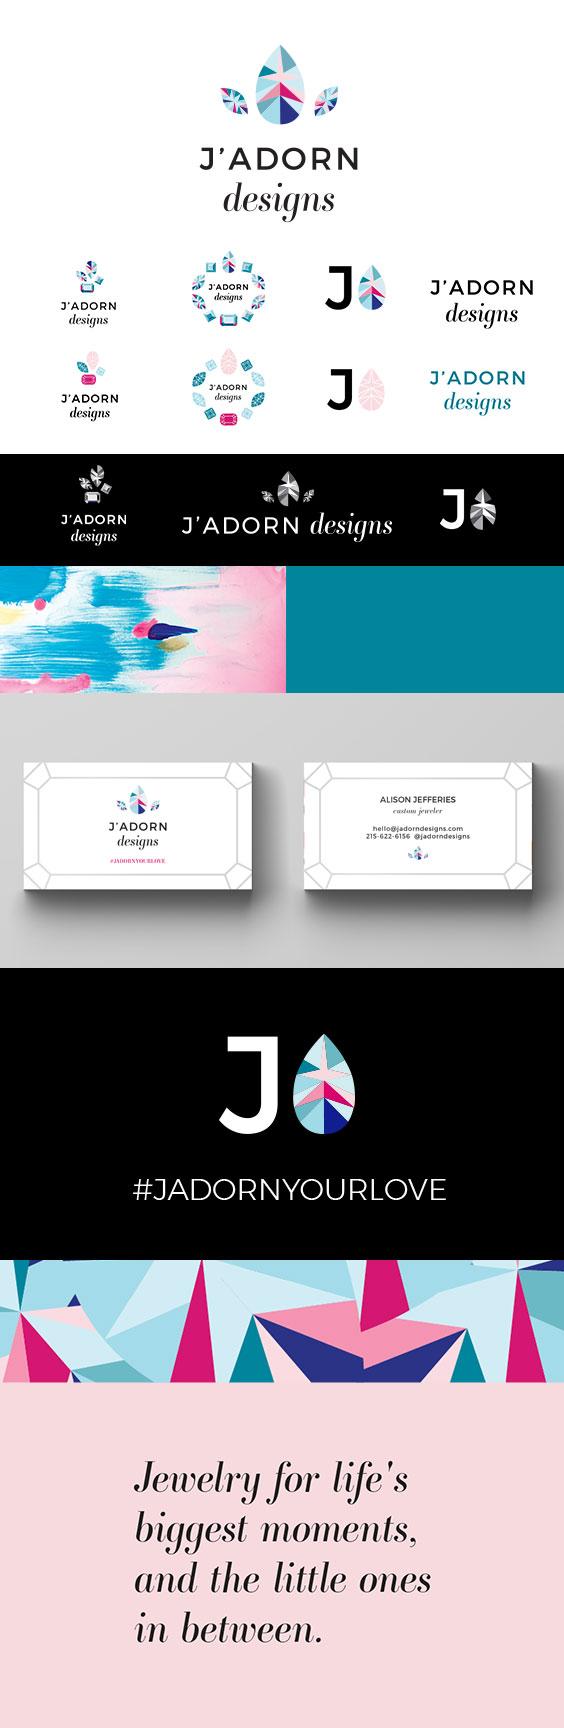 J'Adorn Designs Branding Board // C&V Creative